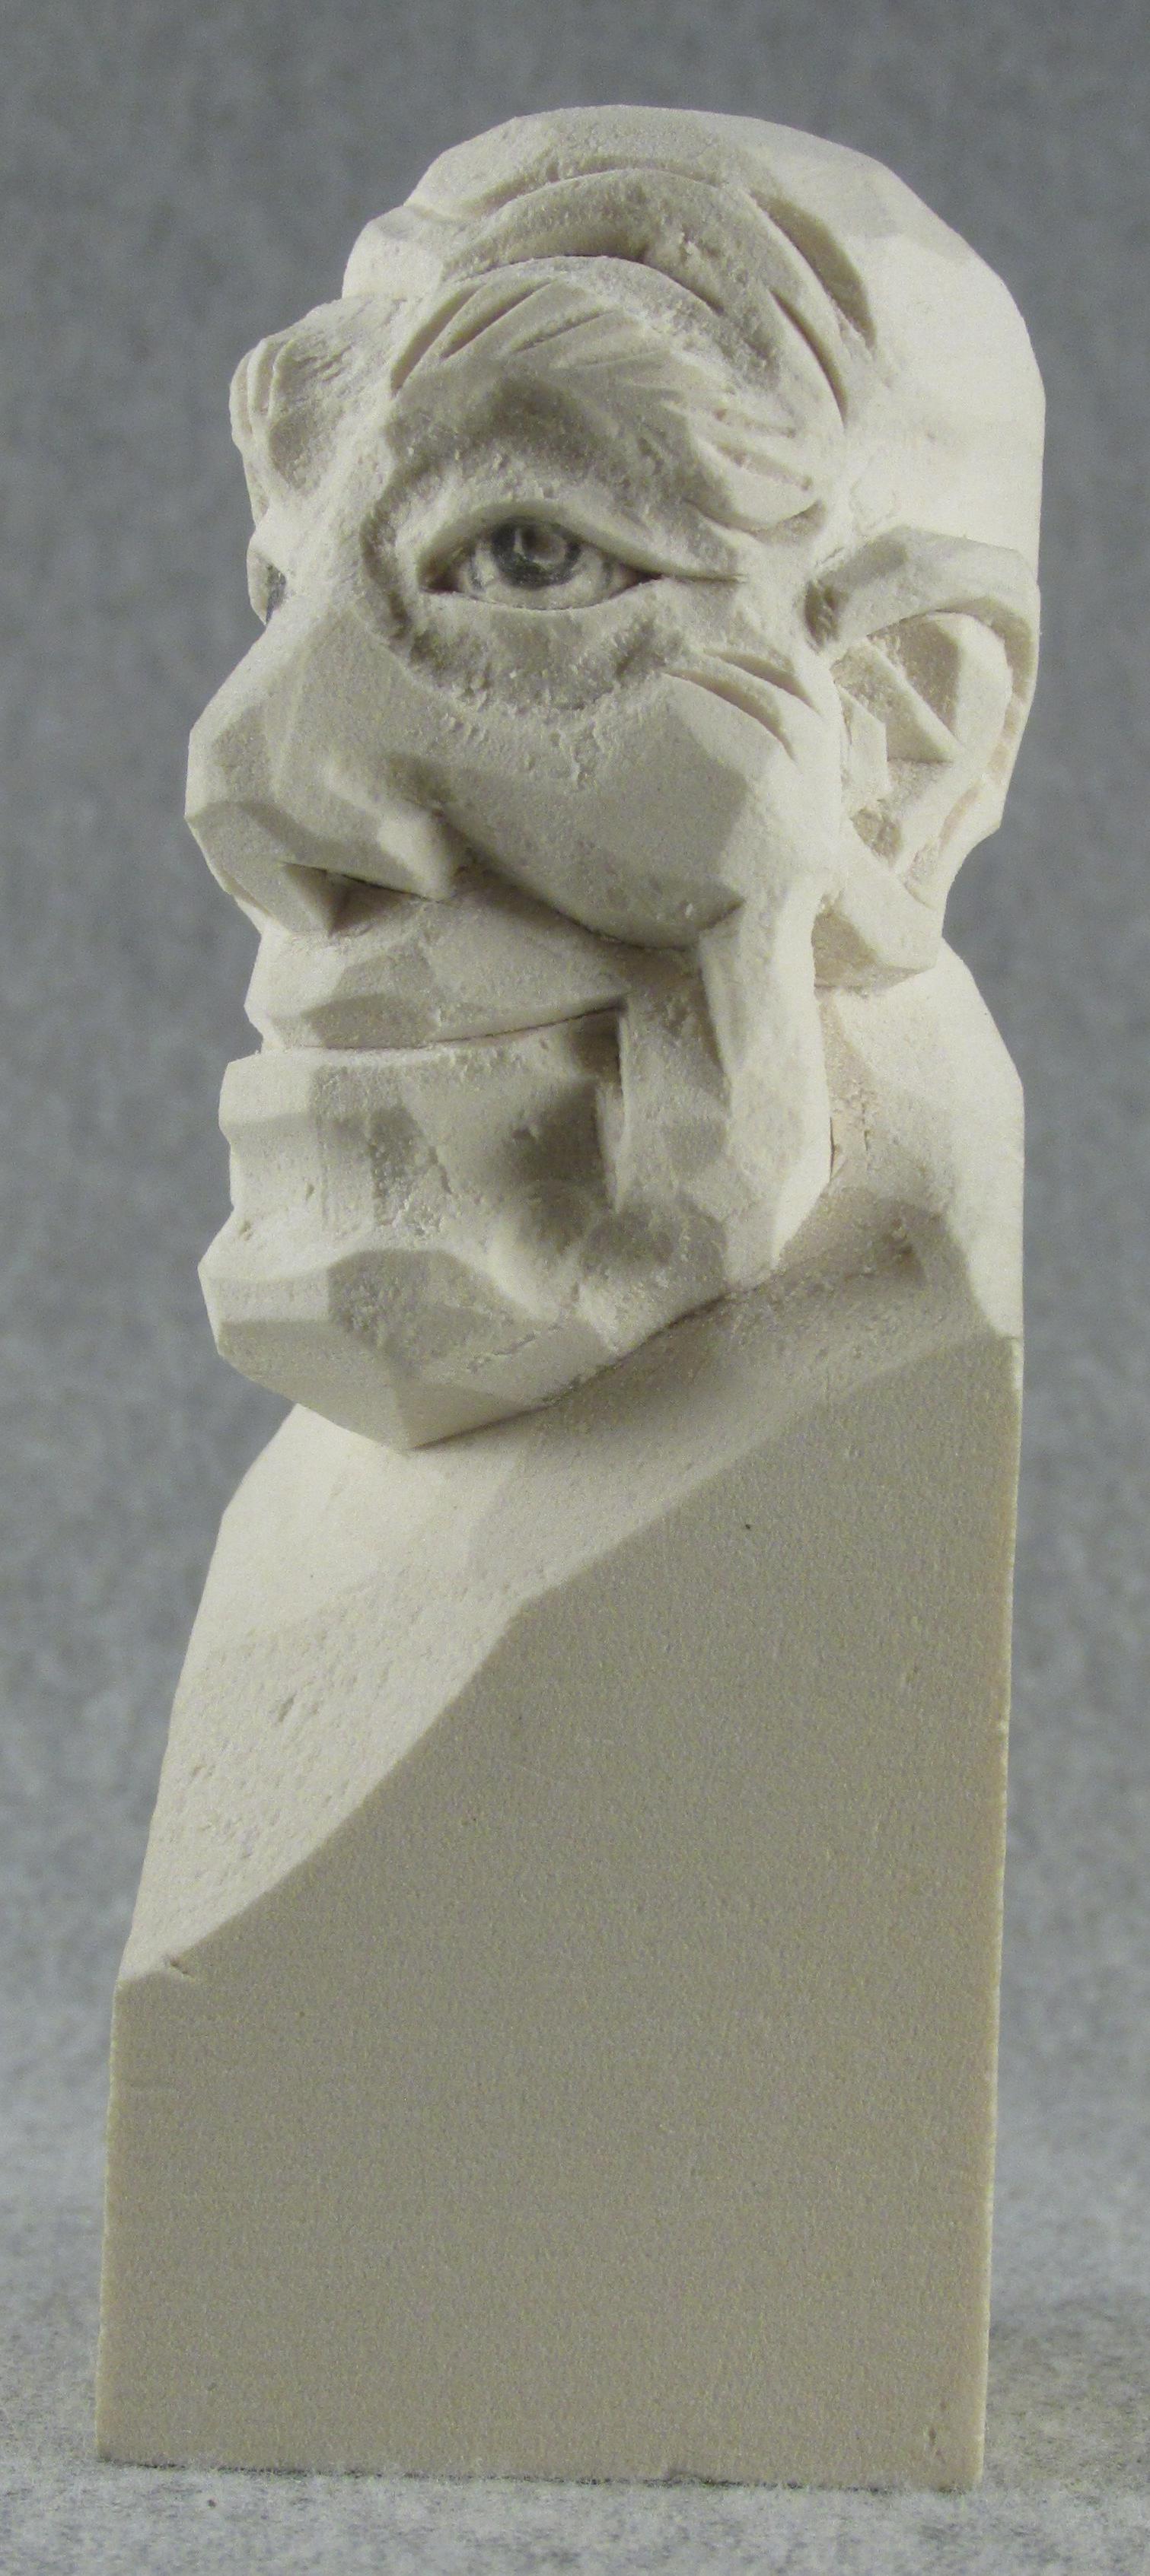 Carving foam carverdale